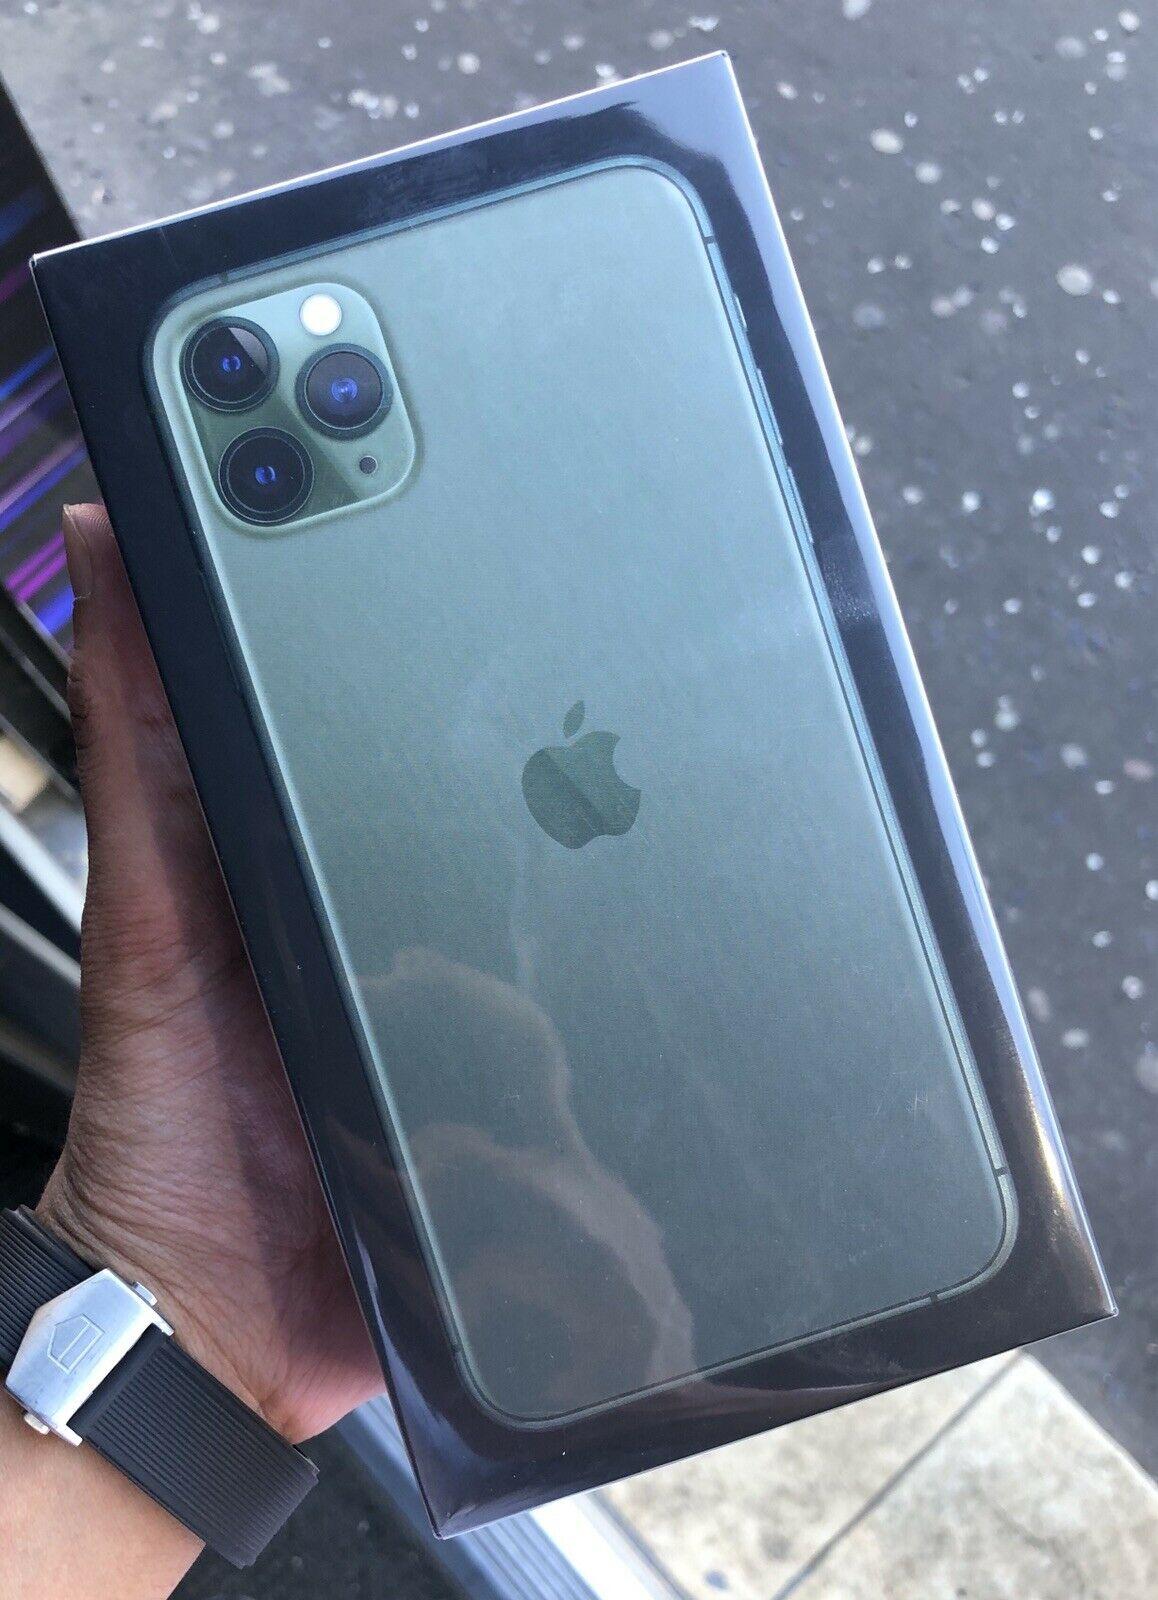 IPhone 7 + Cover Apple - Annunci Torino